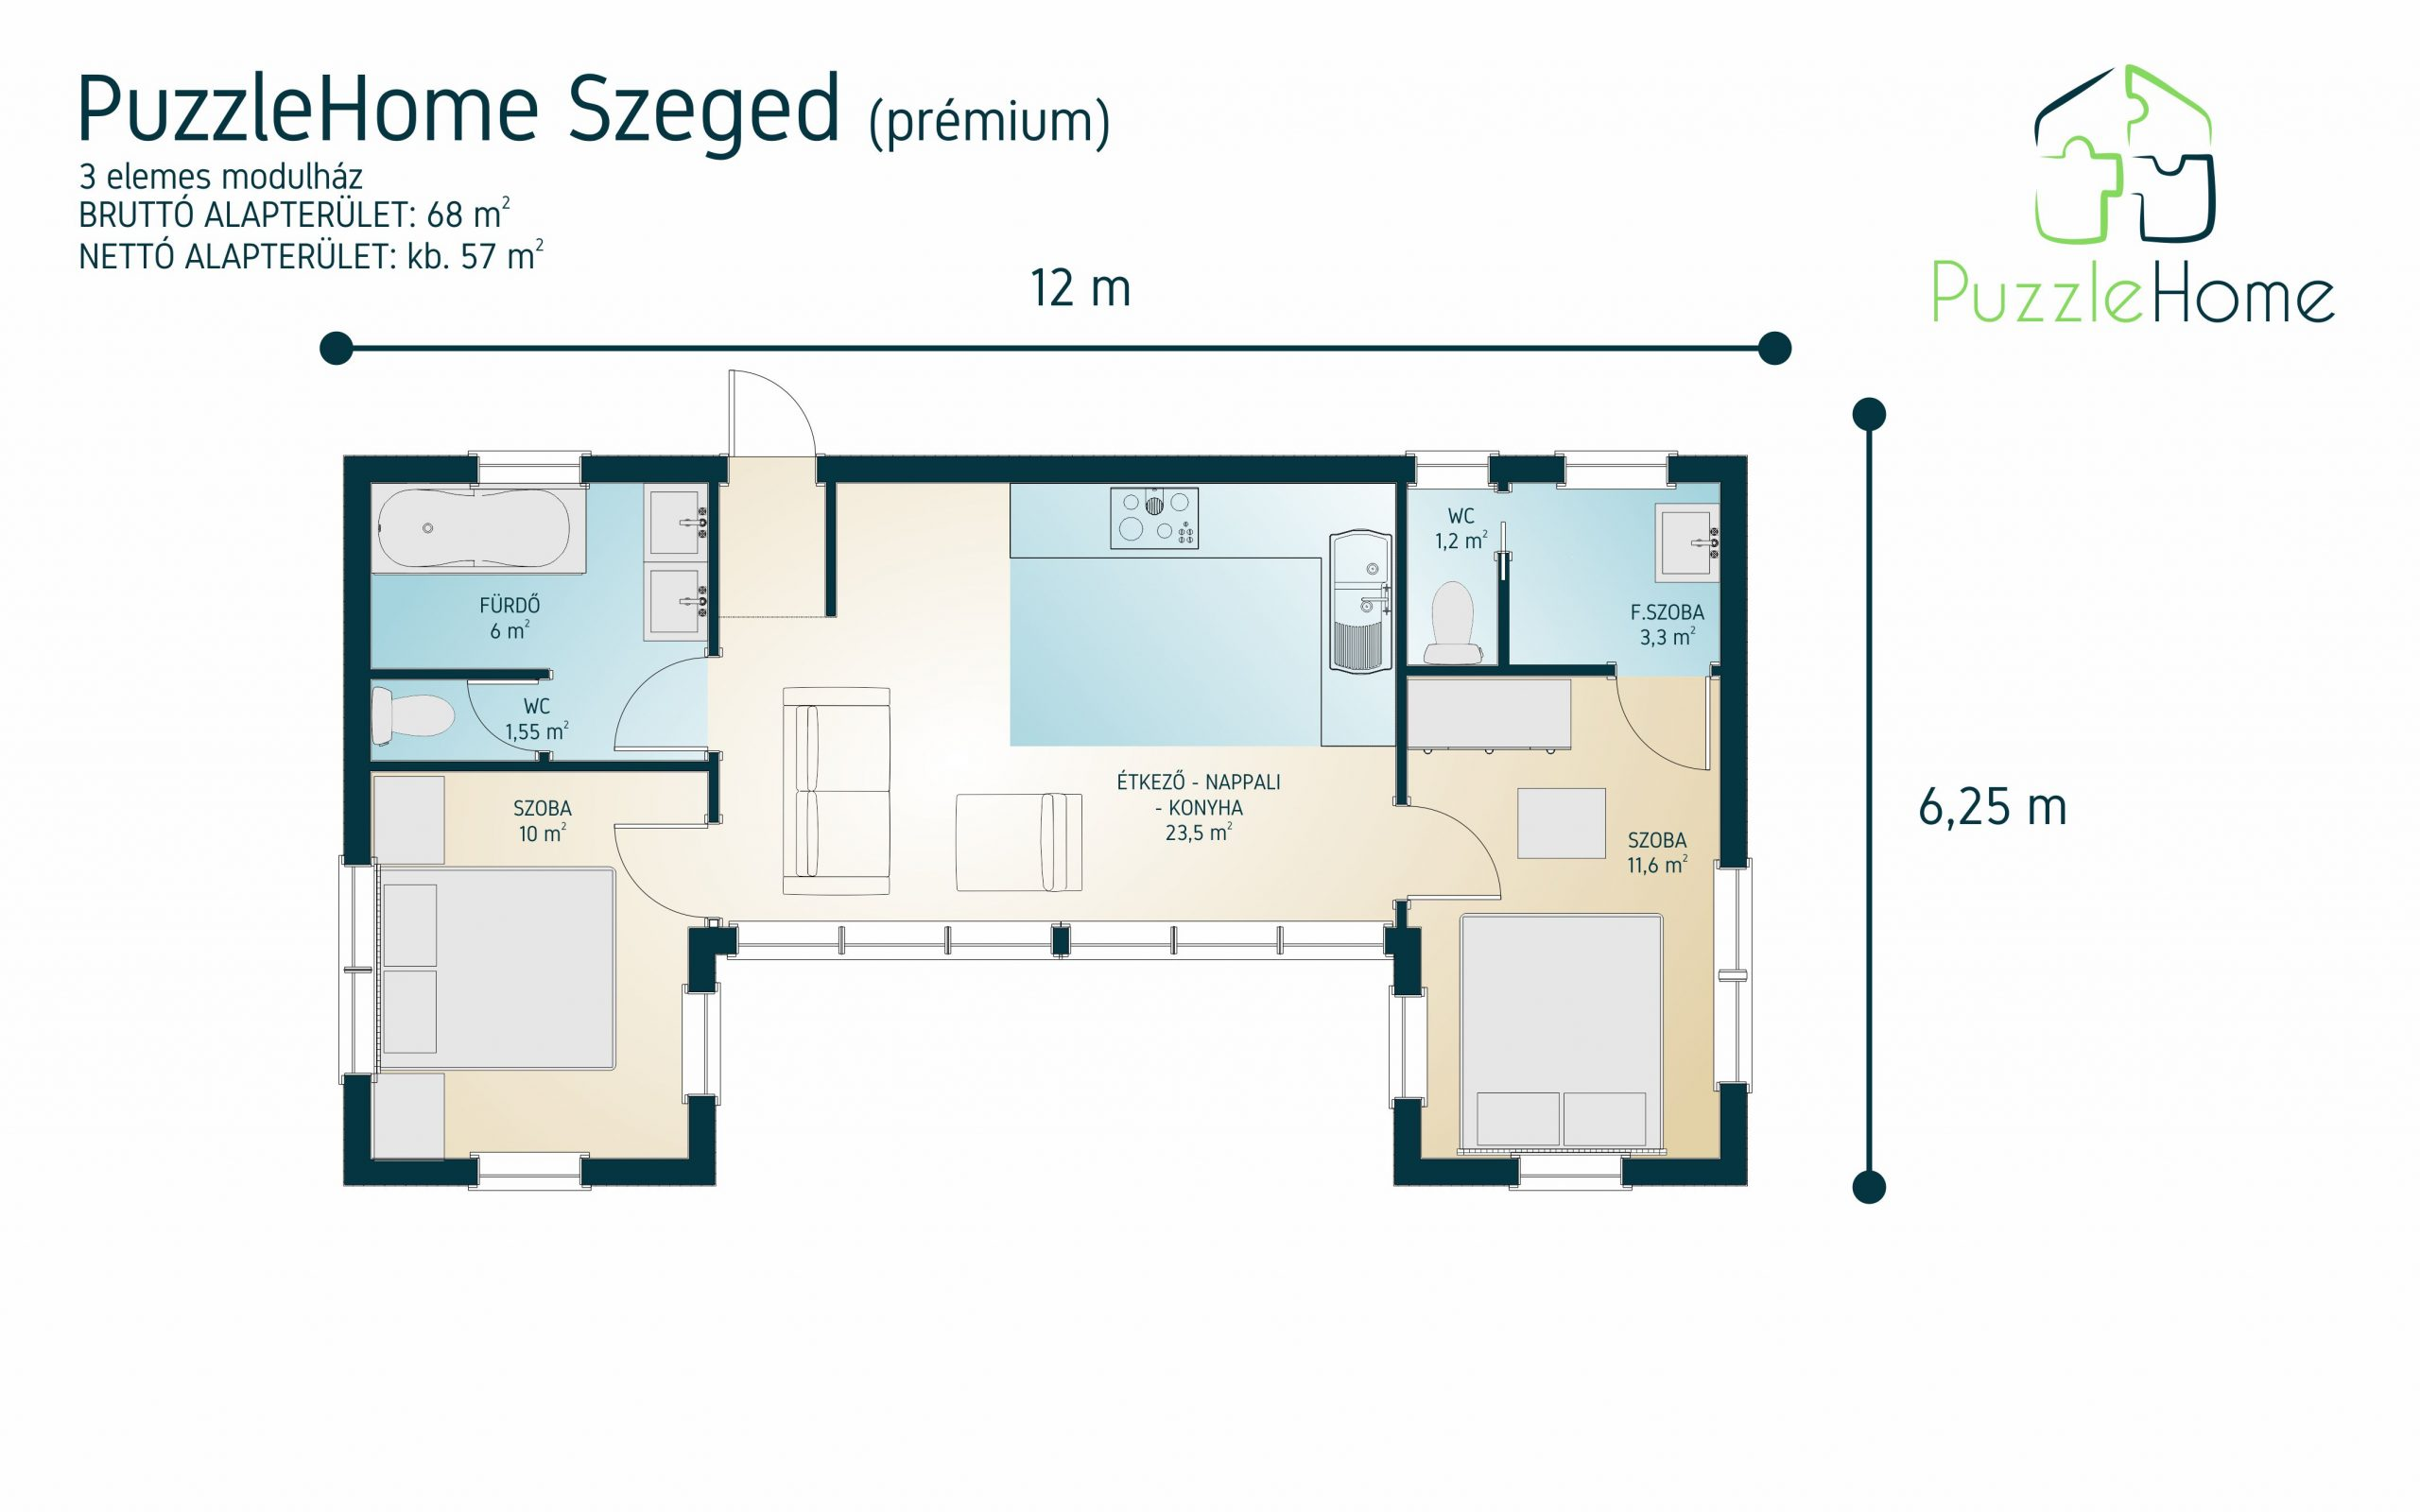 PuzzleHome Szeged típusterv alaprajza